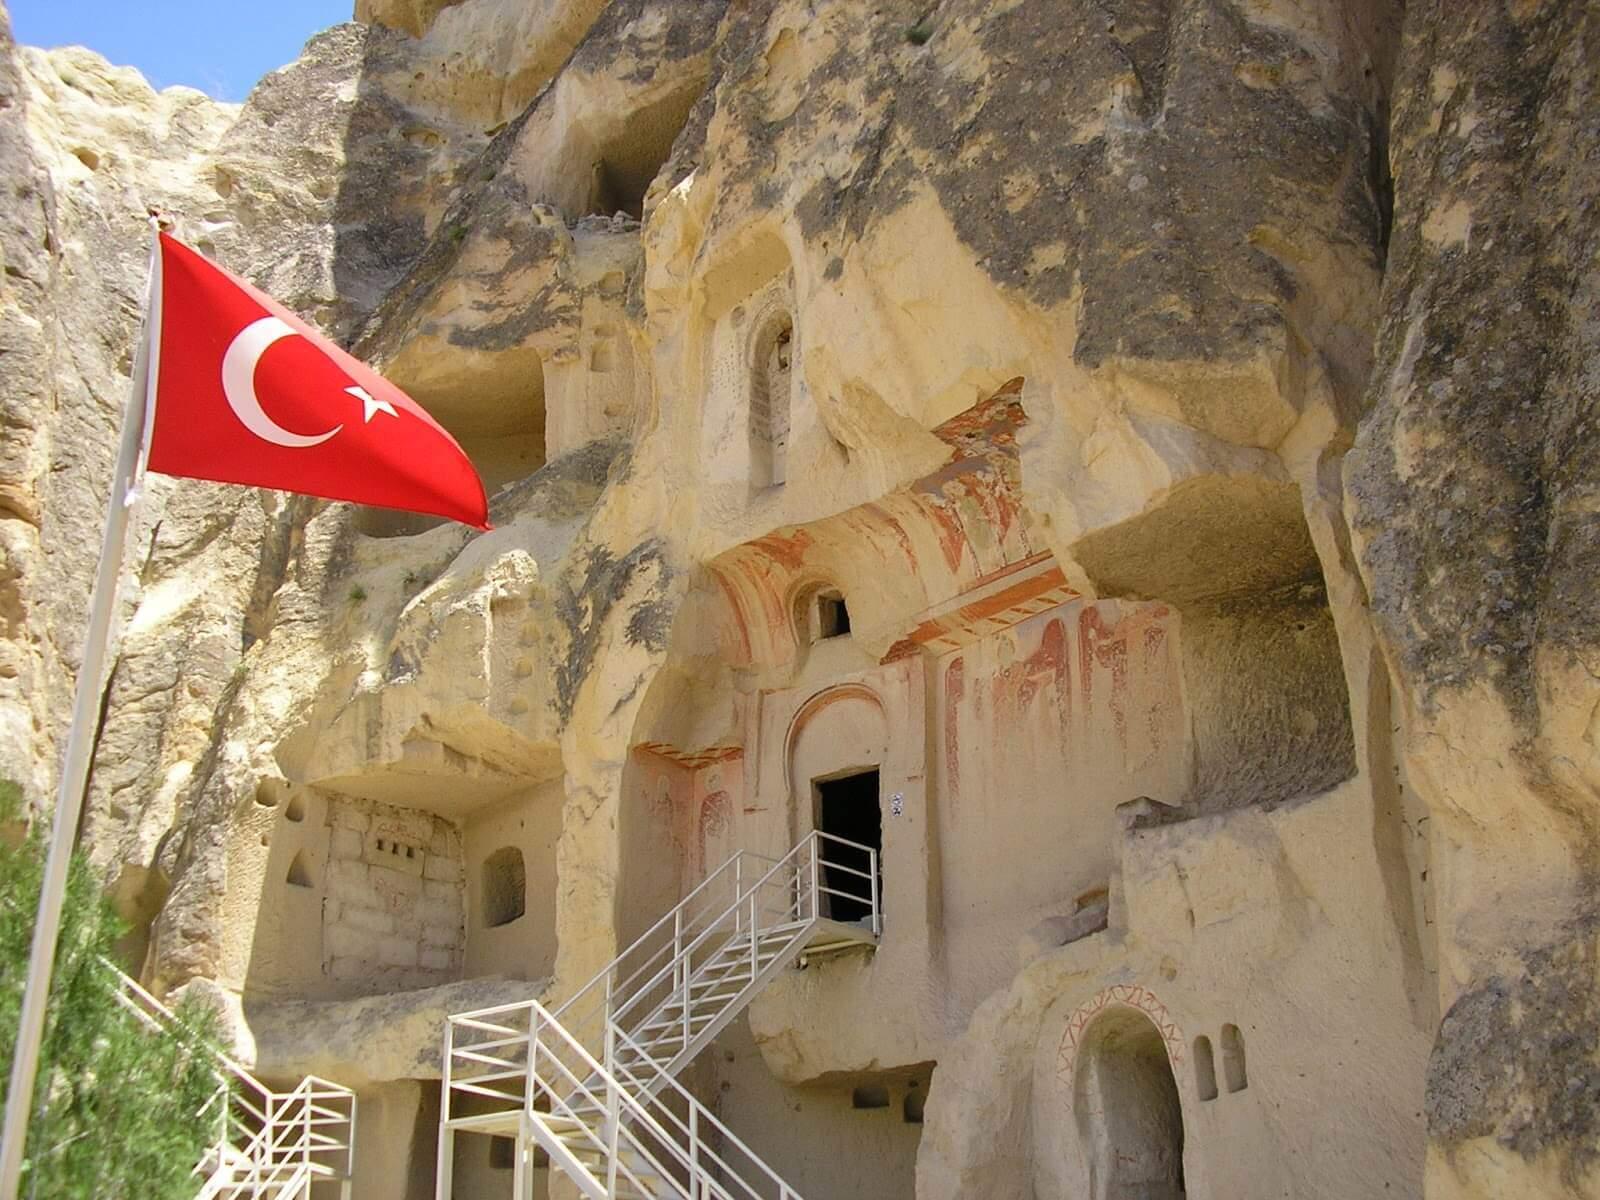 Cavusin Church in Cappadocia